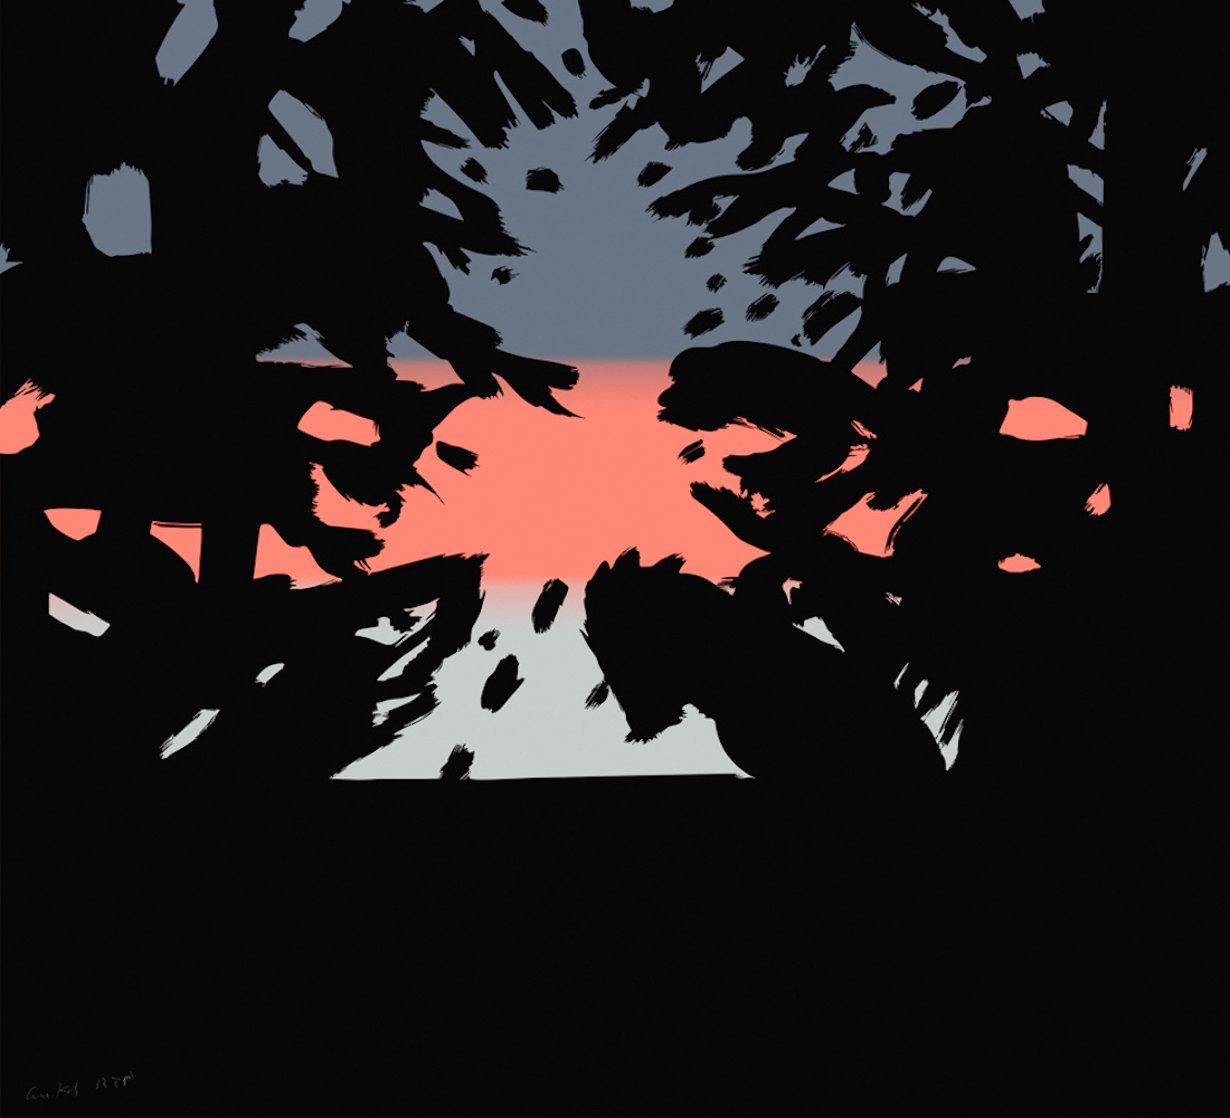 Sunrise Sunset Portfolio: Sunset 2 Super Huge Limited Edition Print by Alex Katz